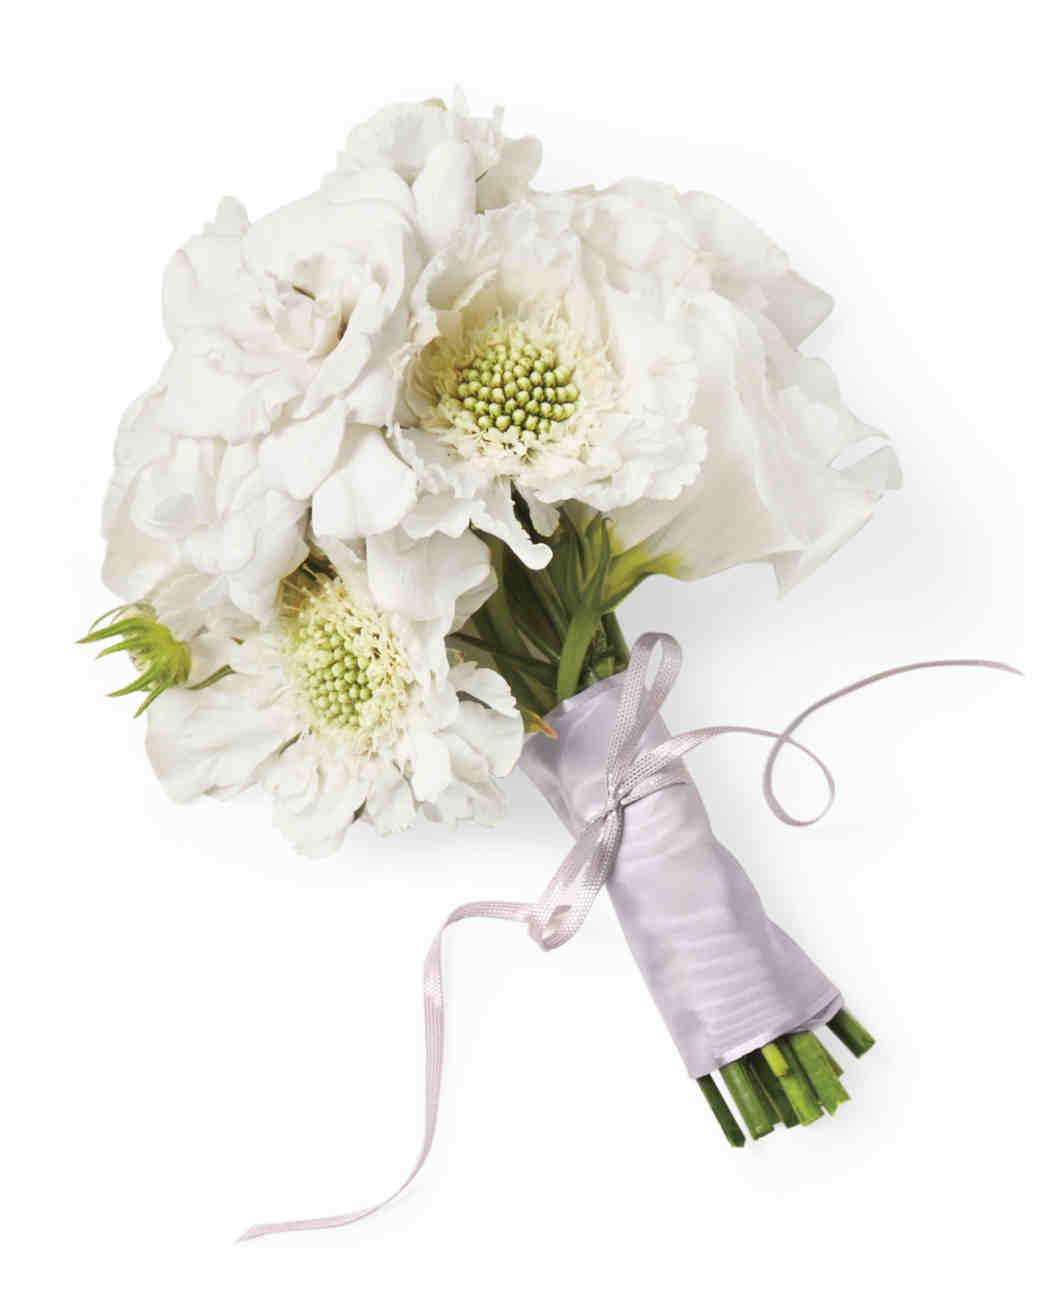 flowers-01-d112318.jpg